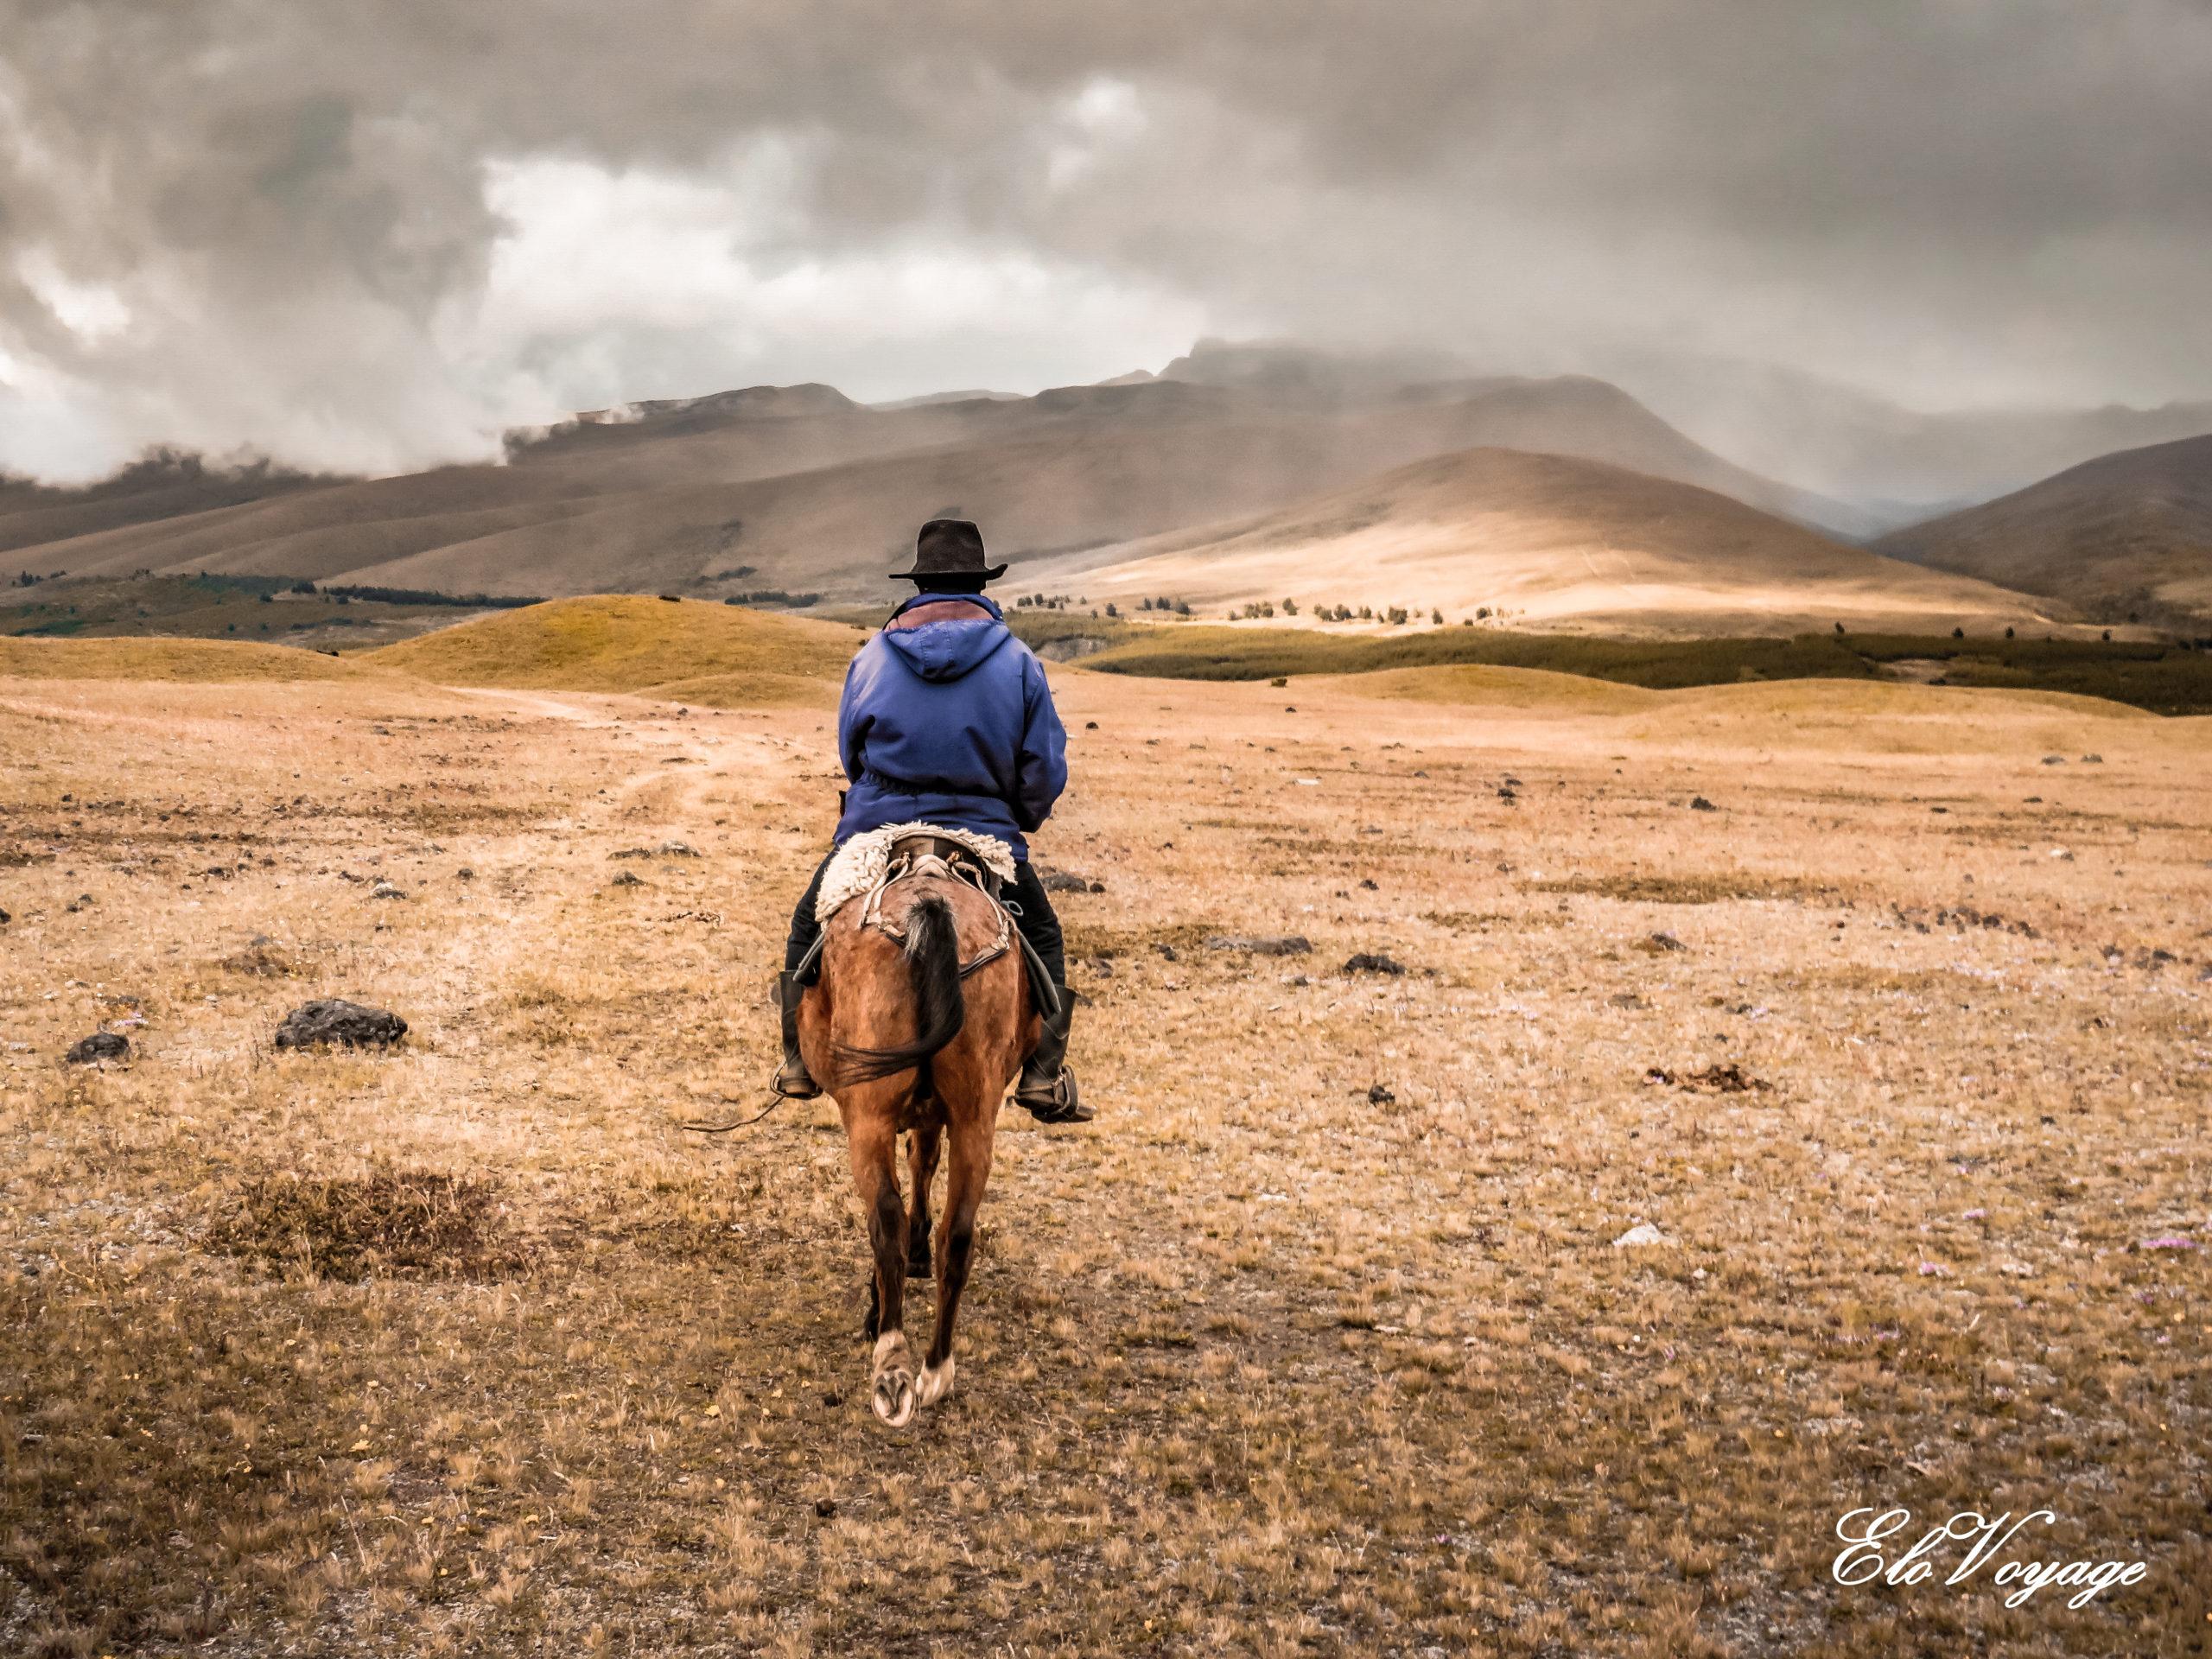 balade-a-cheval-parc-cotopaxi-equateur